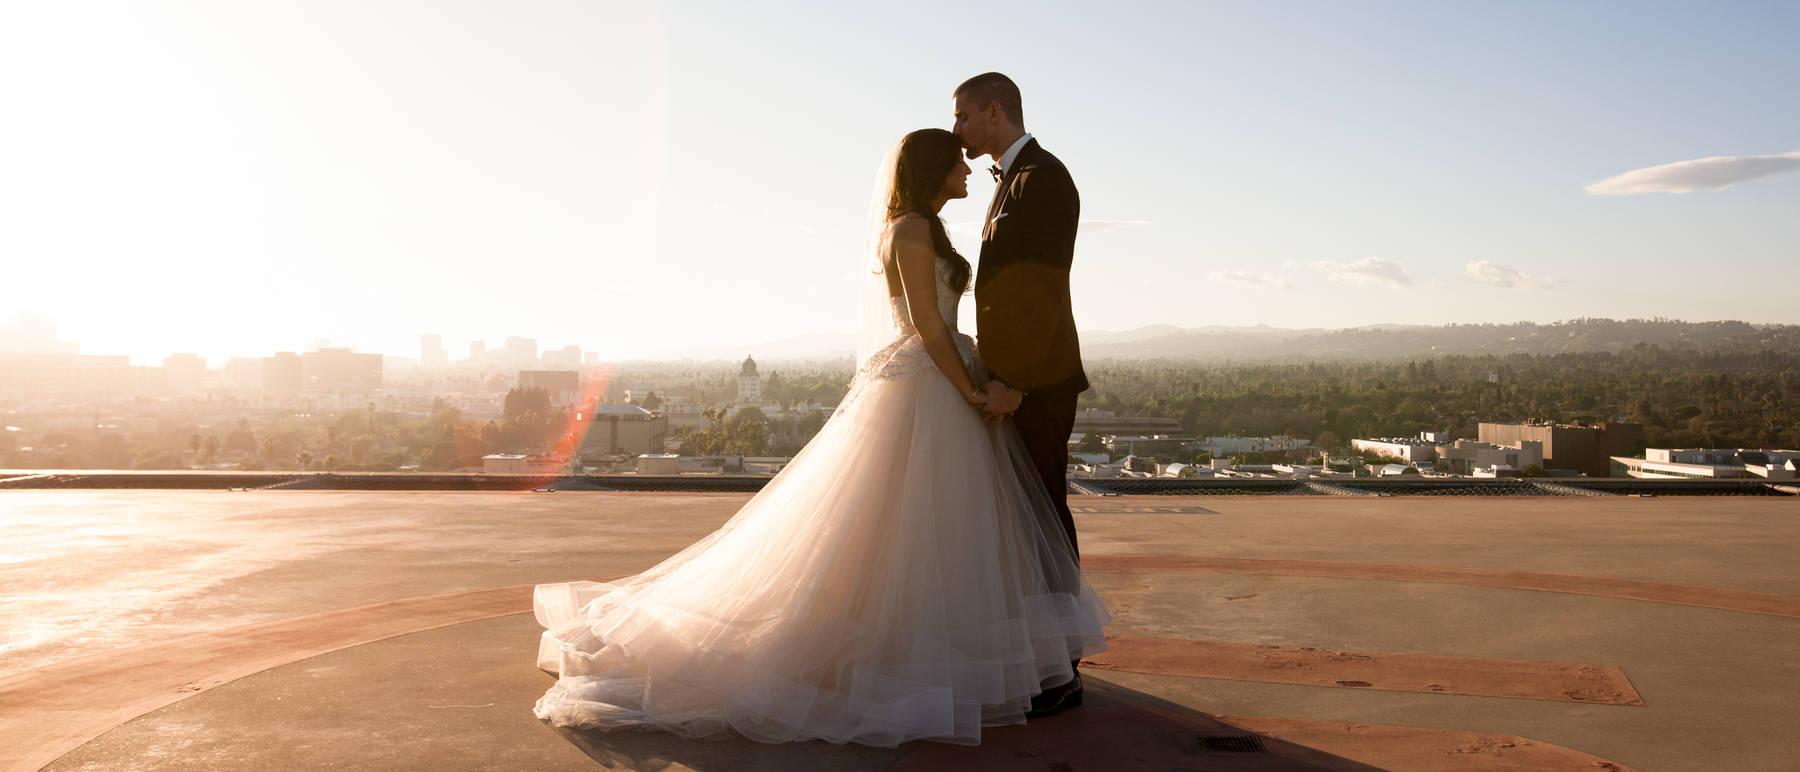 johnandjoseph-wedding-photographer-hz-slider-179